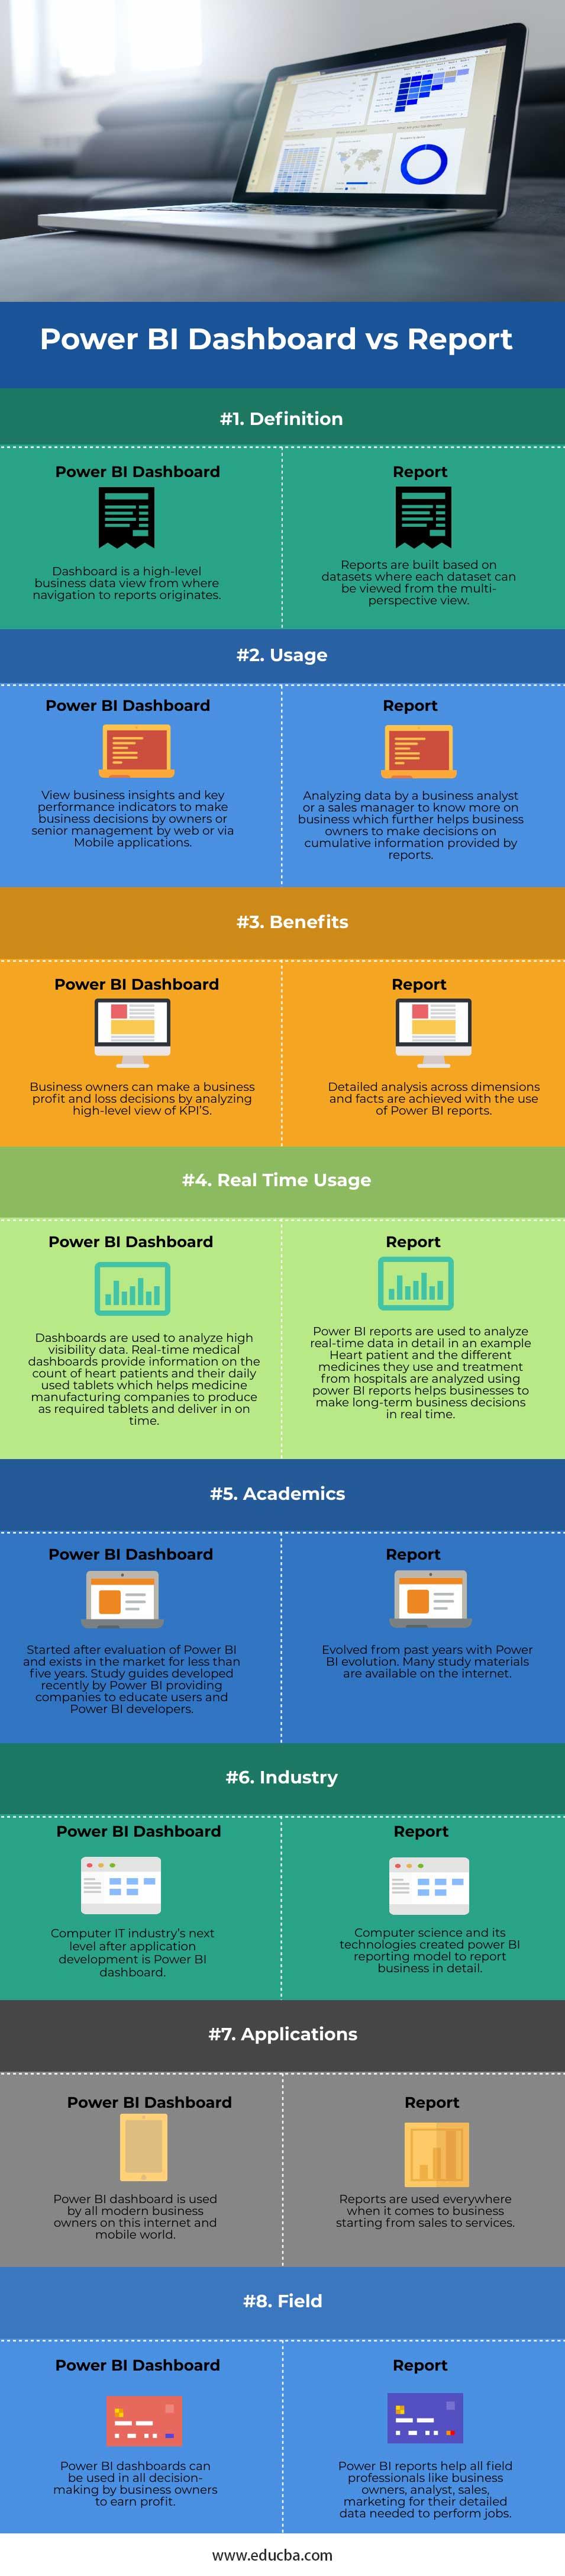 Power-BI-Dashboard-vs-Report-info